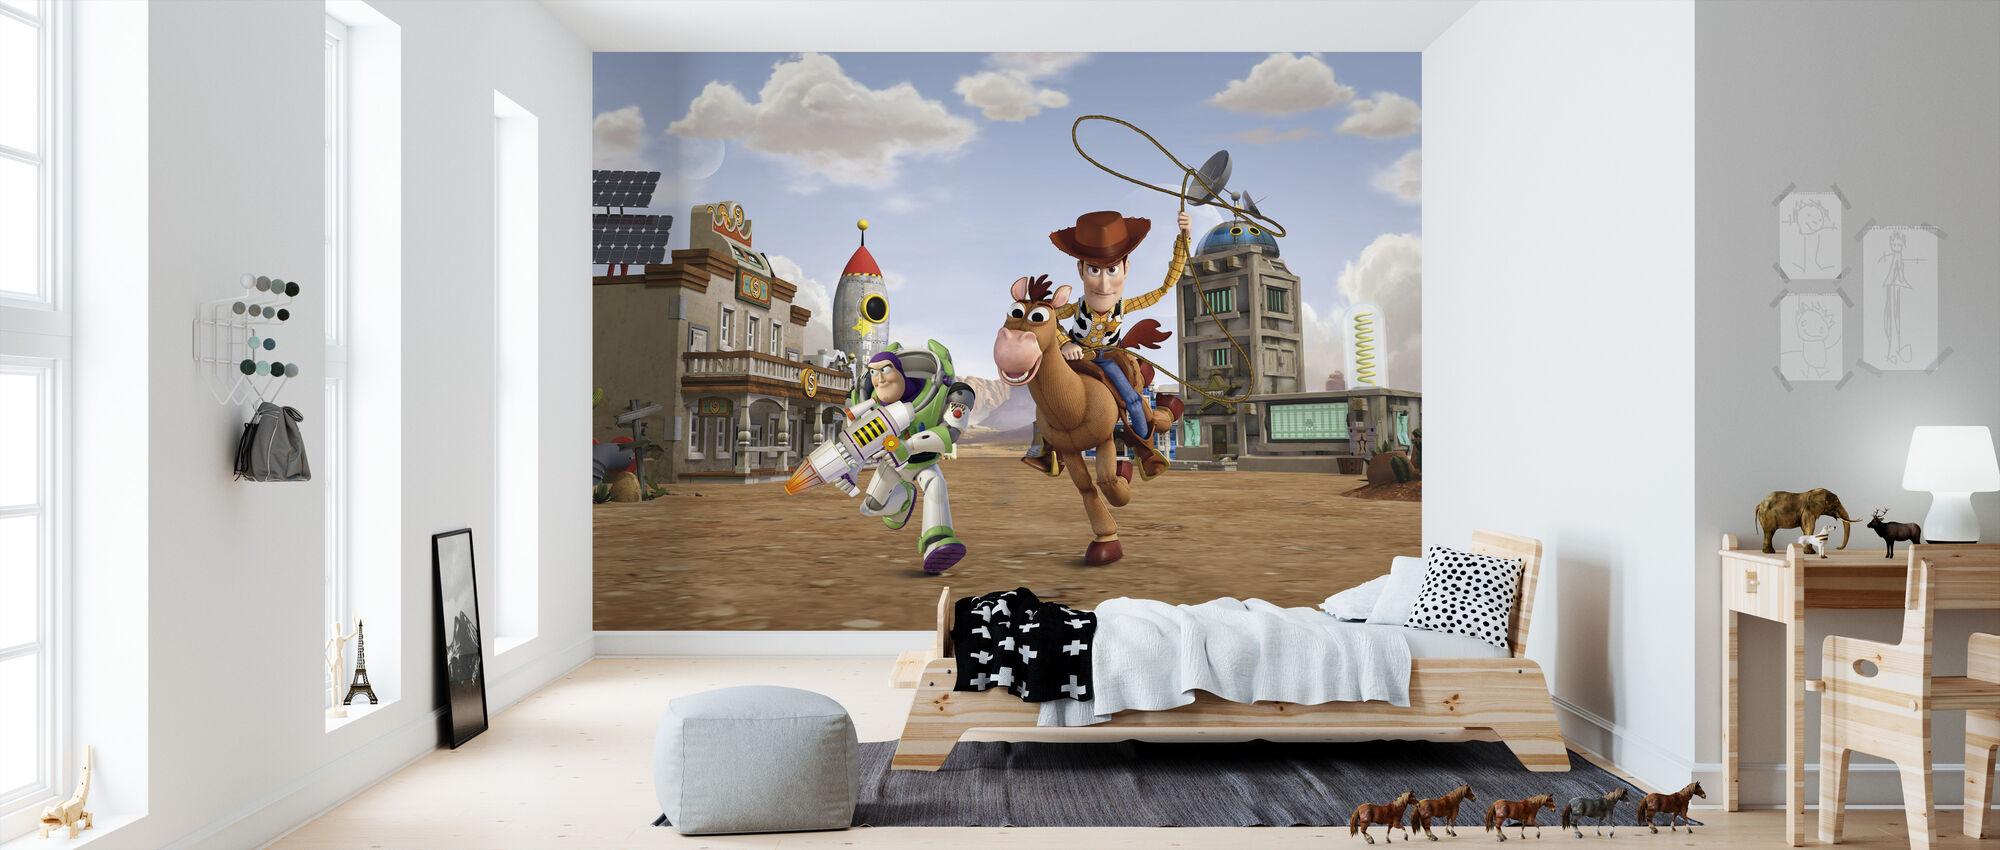 Toy Story - Bullseye Woody Buzz Lightyear - Tapet - Barnerom